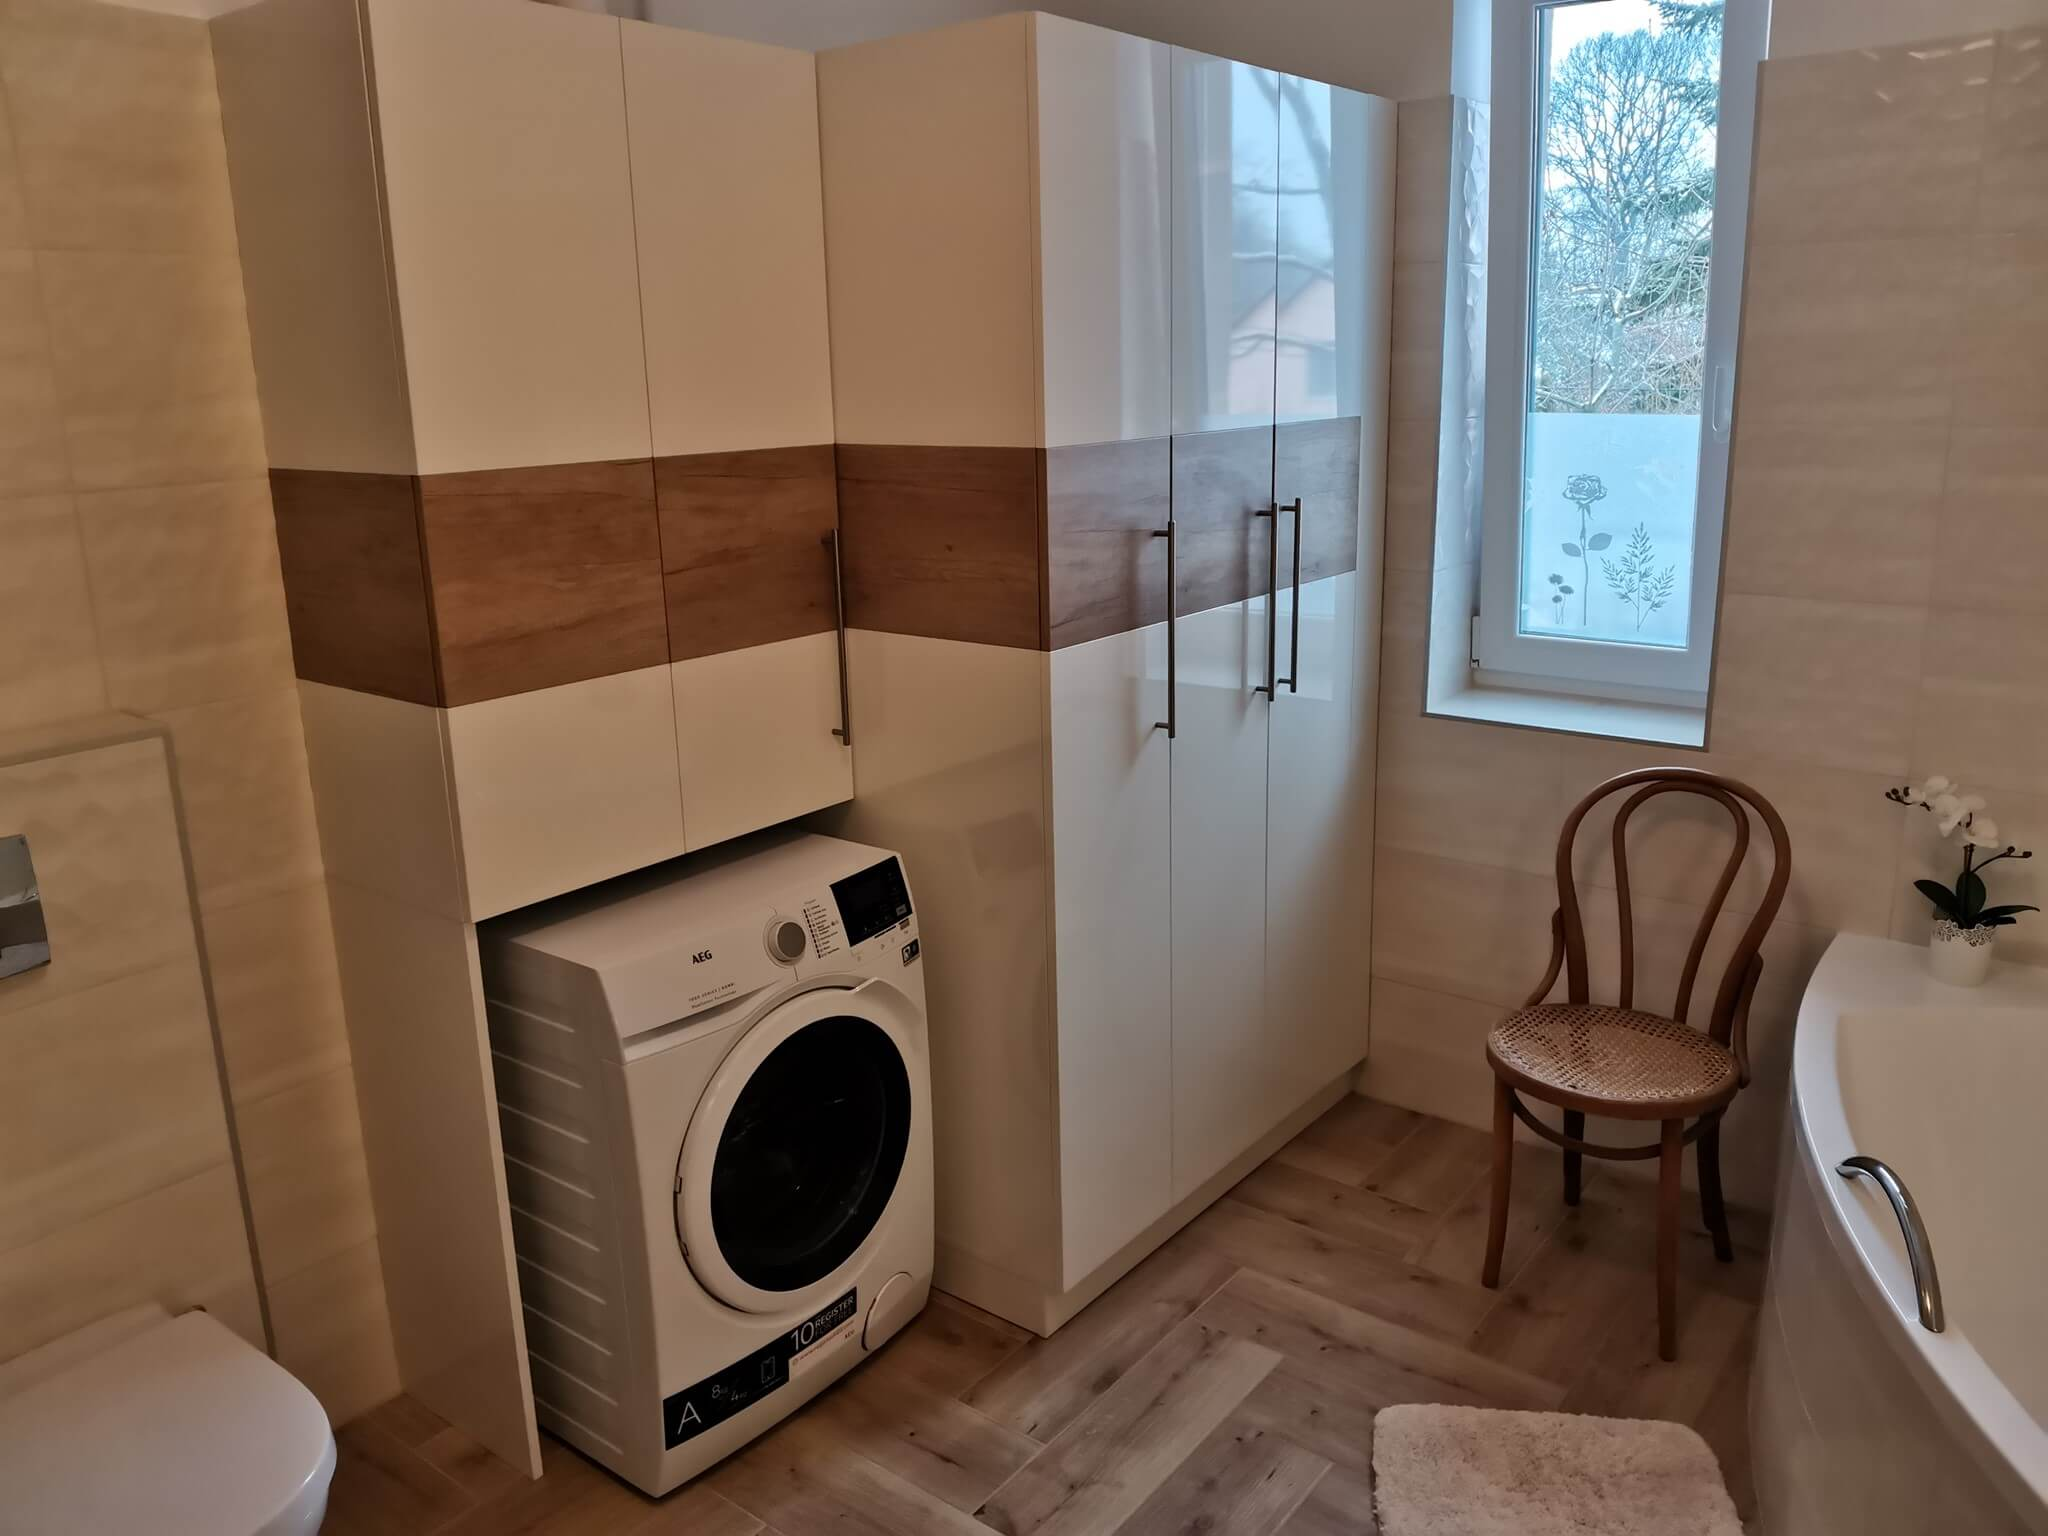 mbutor.hu - fürdőszobabútor 4